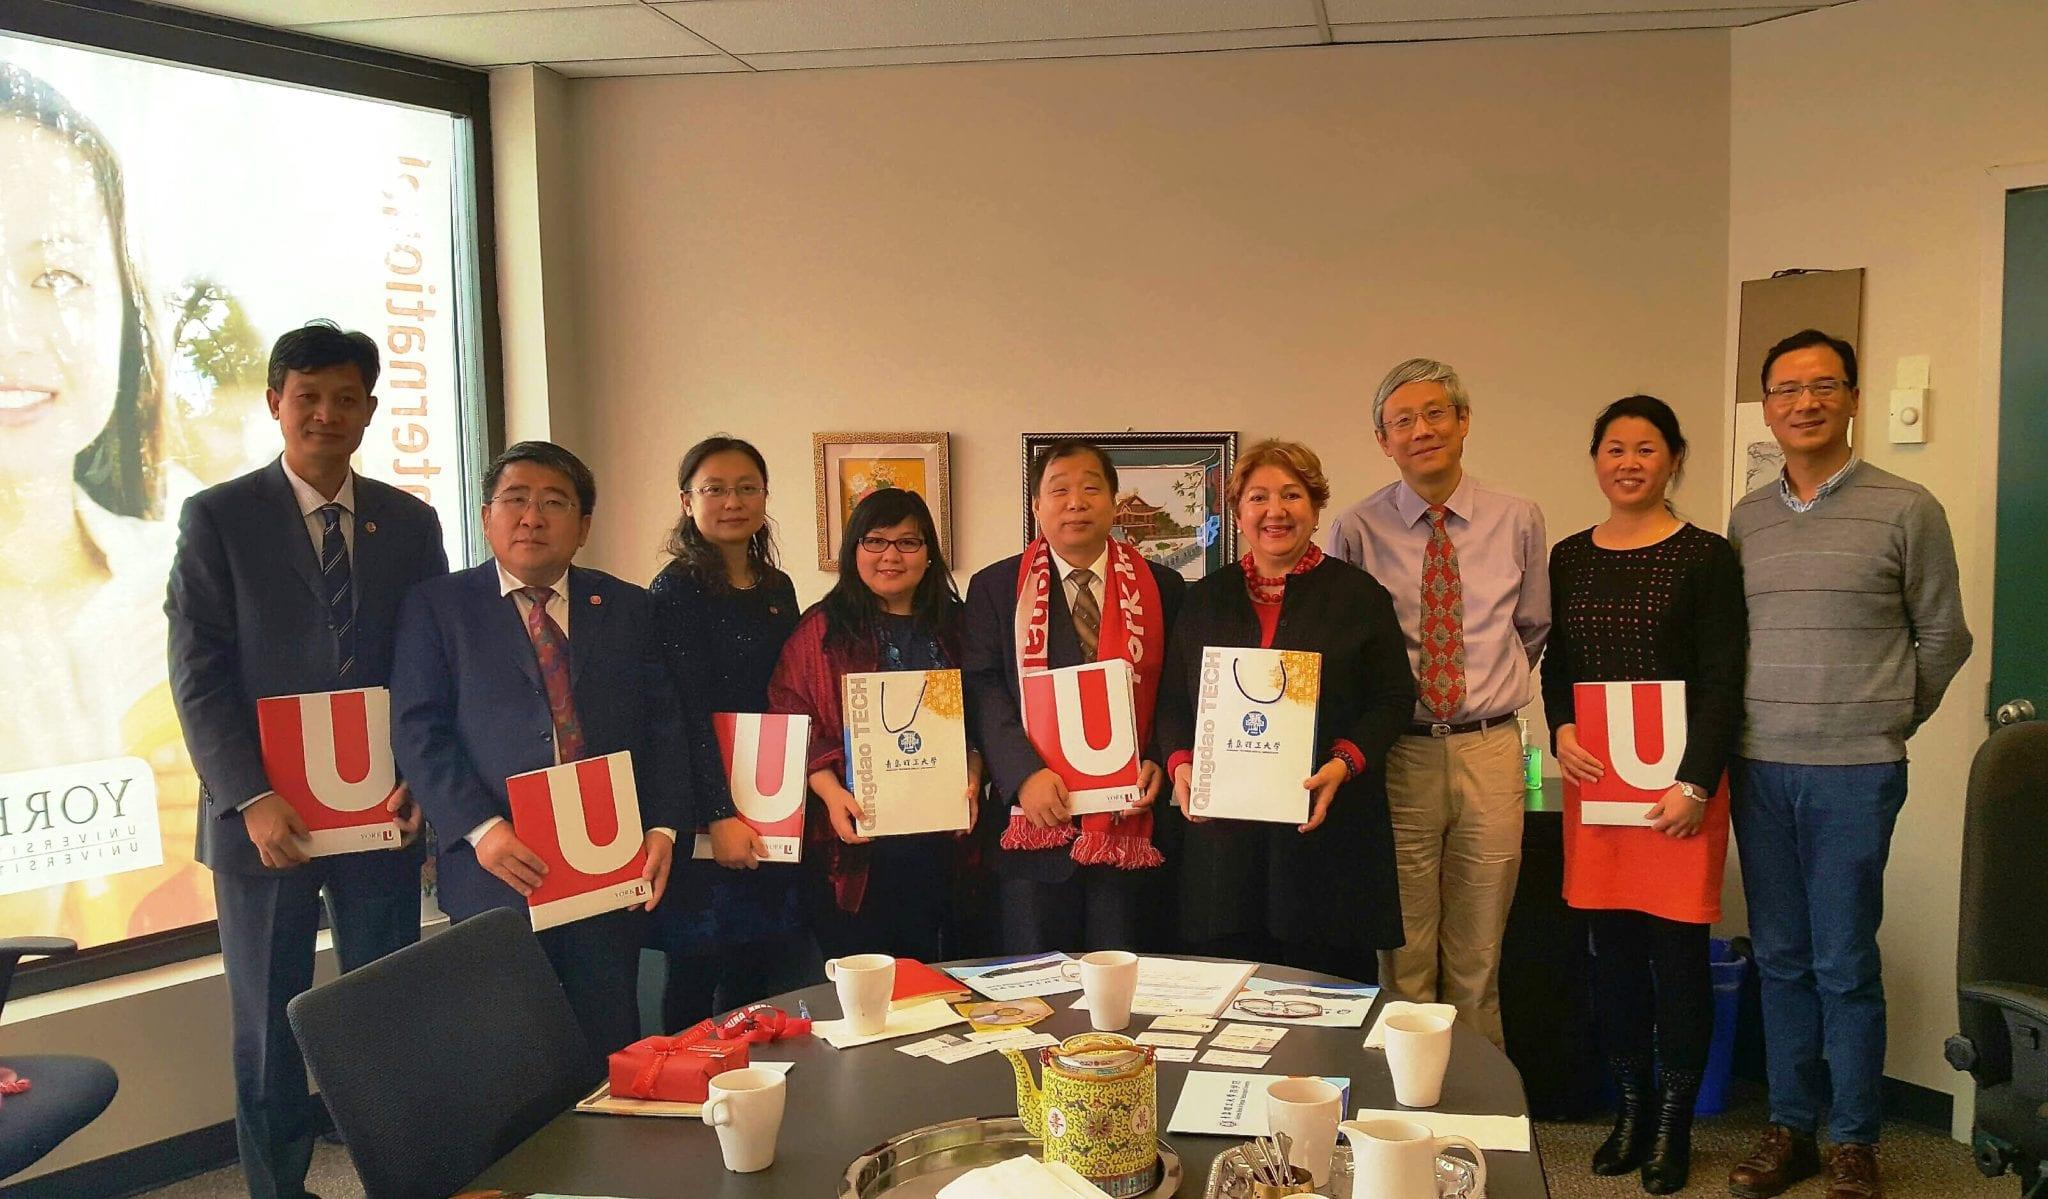 York International, Lassonde Faculty of Engineering and Qingdao University of Technology, China, Nov 2016